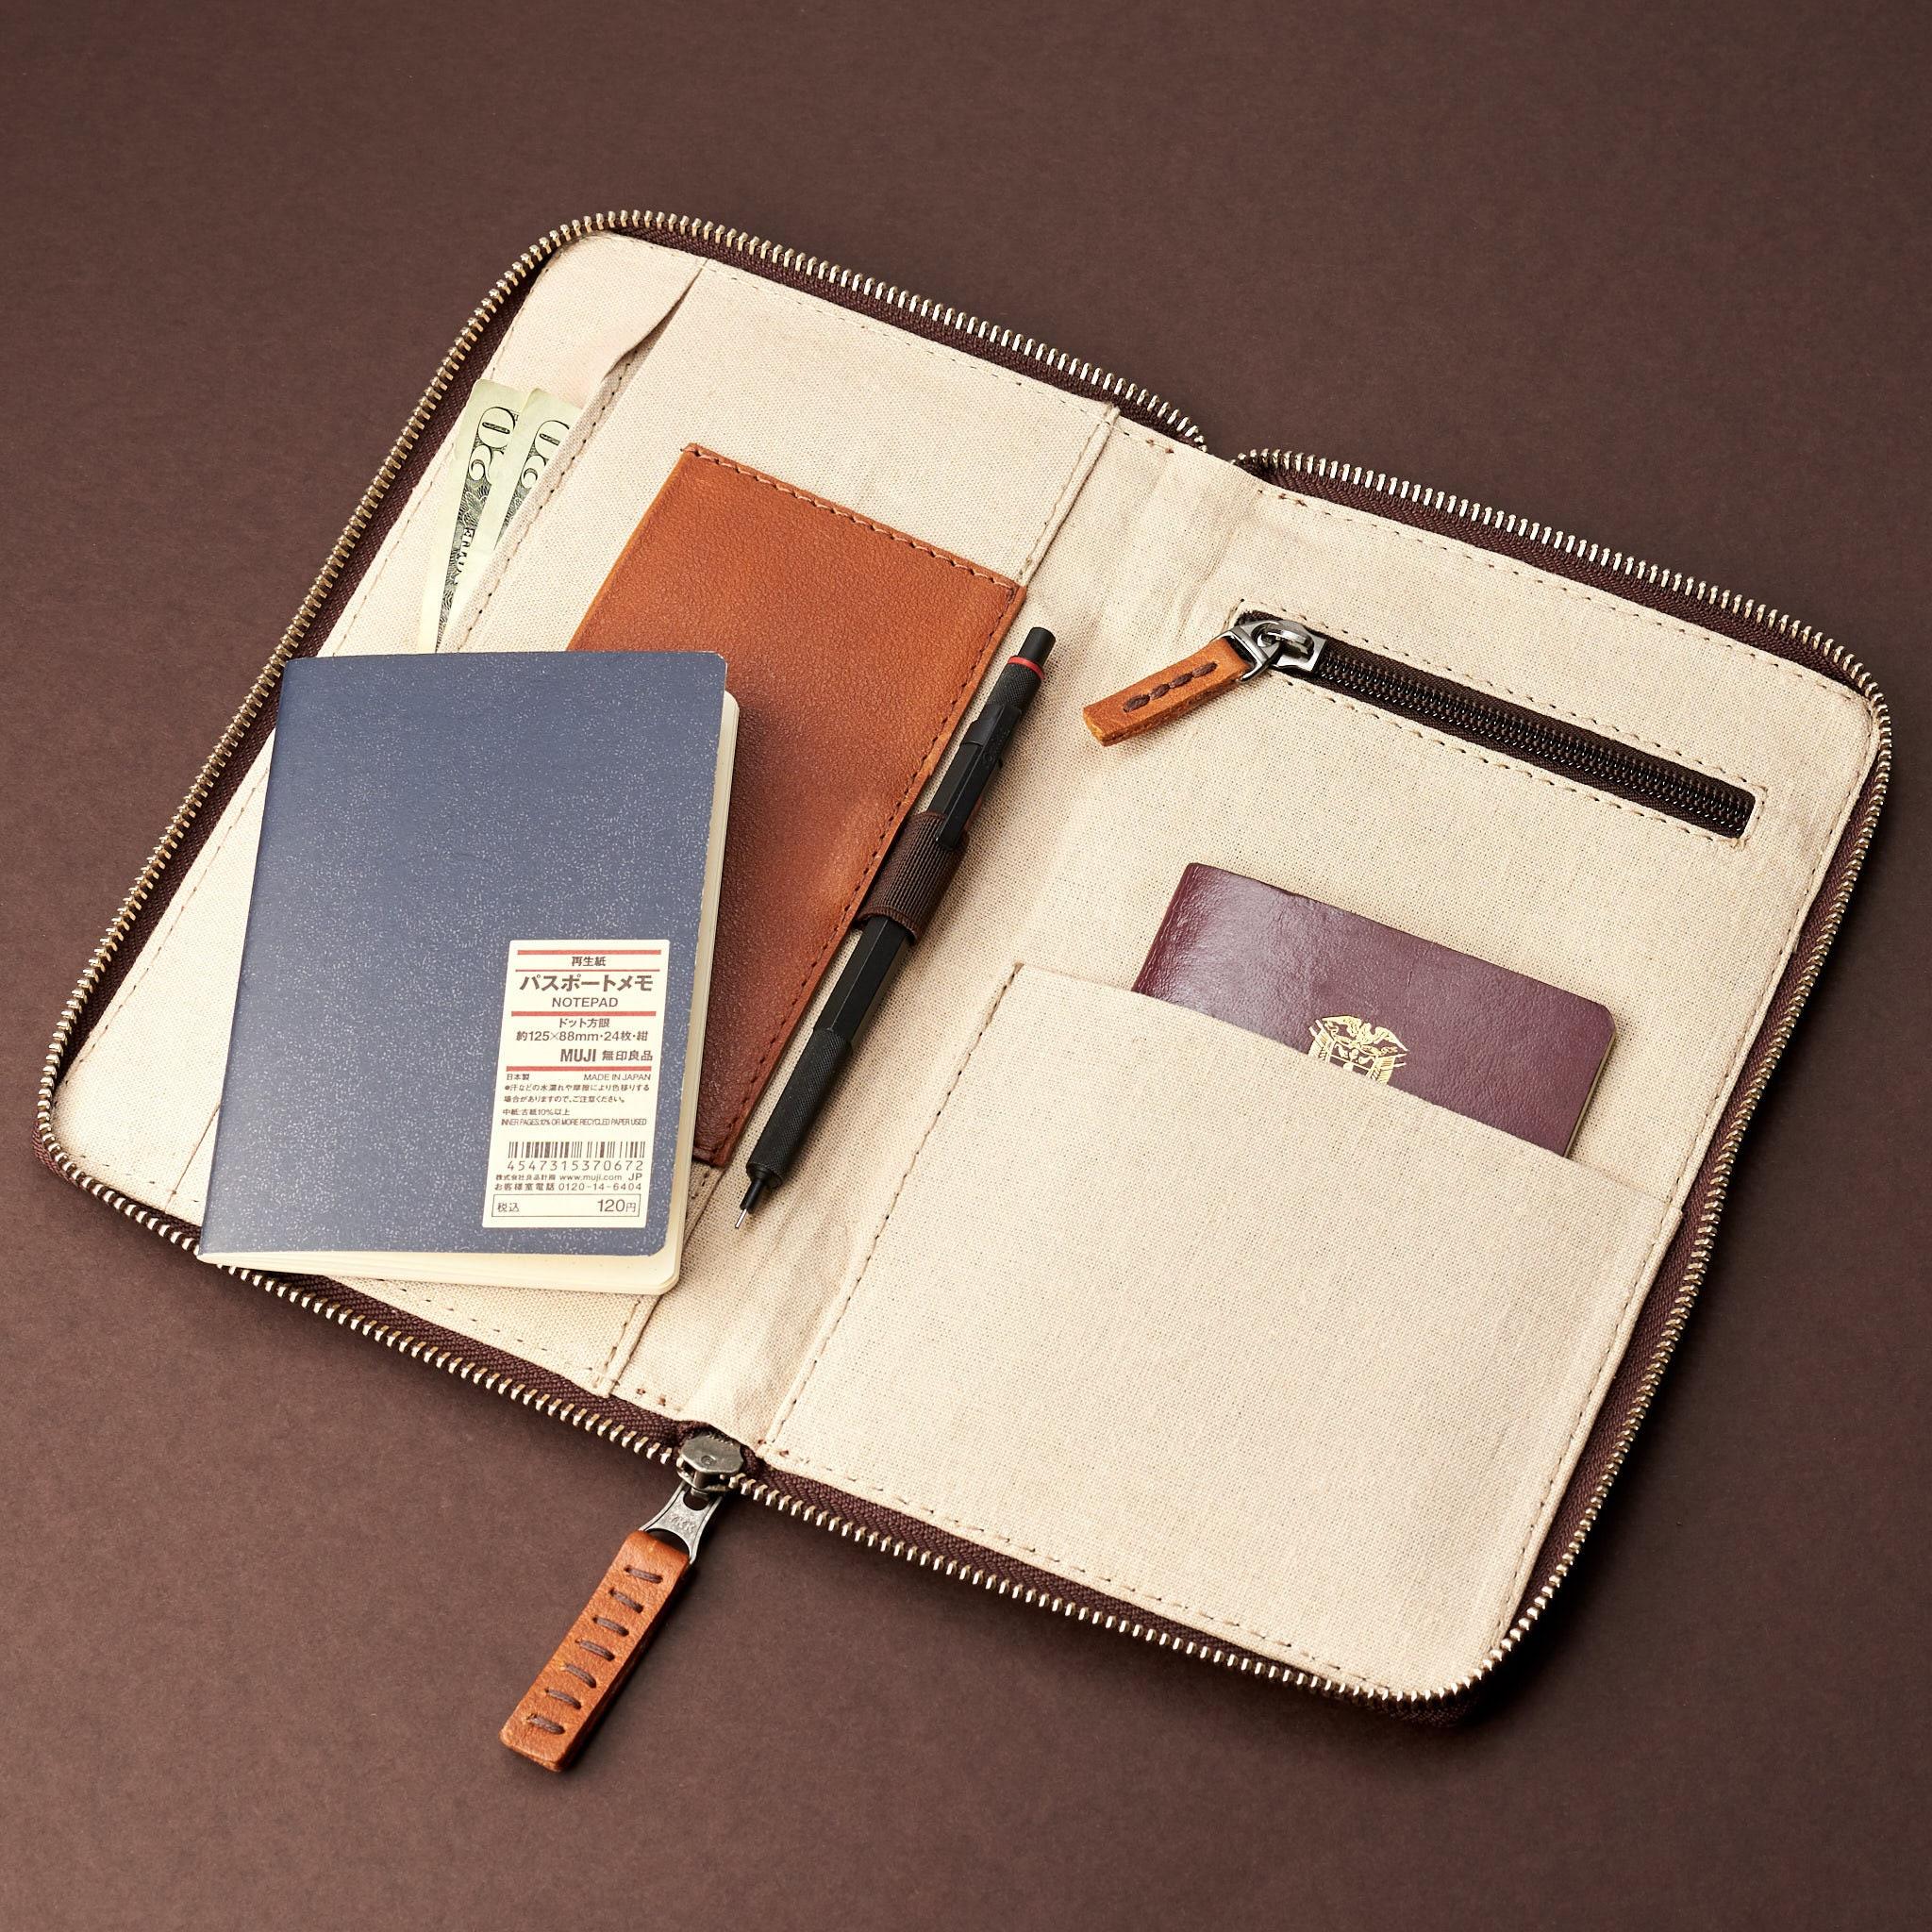 01b18e5d3e4f Tan Leather Travel Document Organizer, Men Passport Wallet, Personalized  Passport Holder, Customized Passport Cover. Monogram Mens Gifts